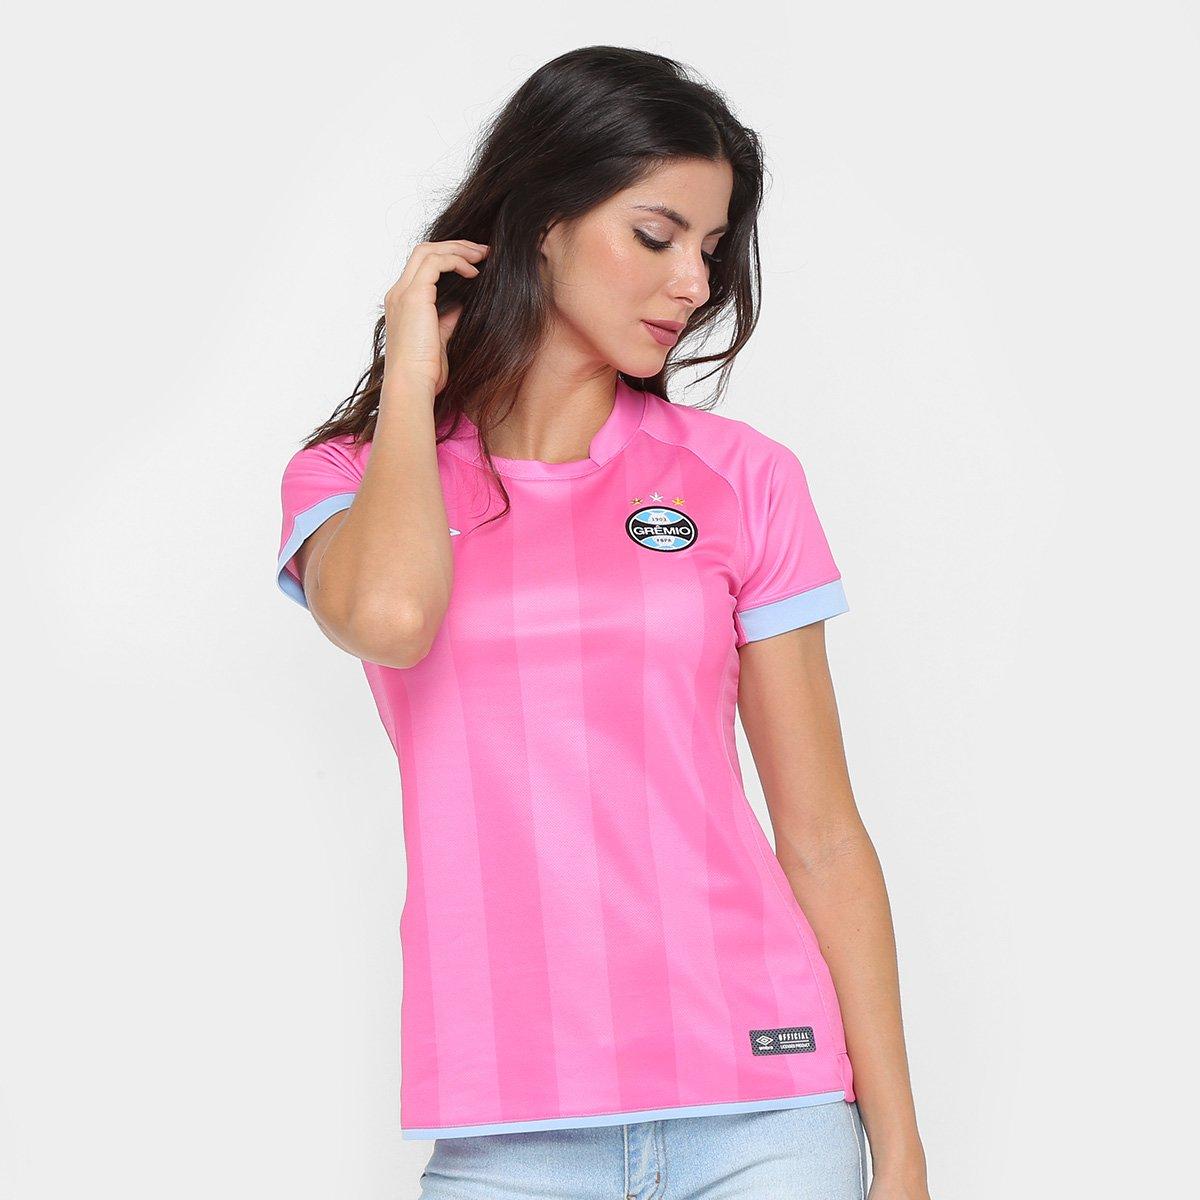 Camisa Grêmio Outubro Rosa 17 18 s n° Umbro Feminina - Rosa e Azul ... 7168af3ee05b9